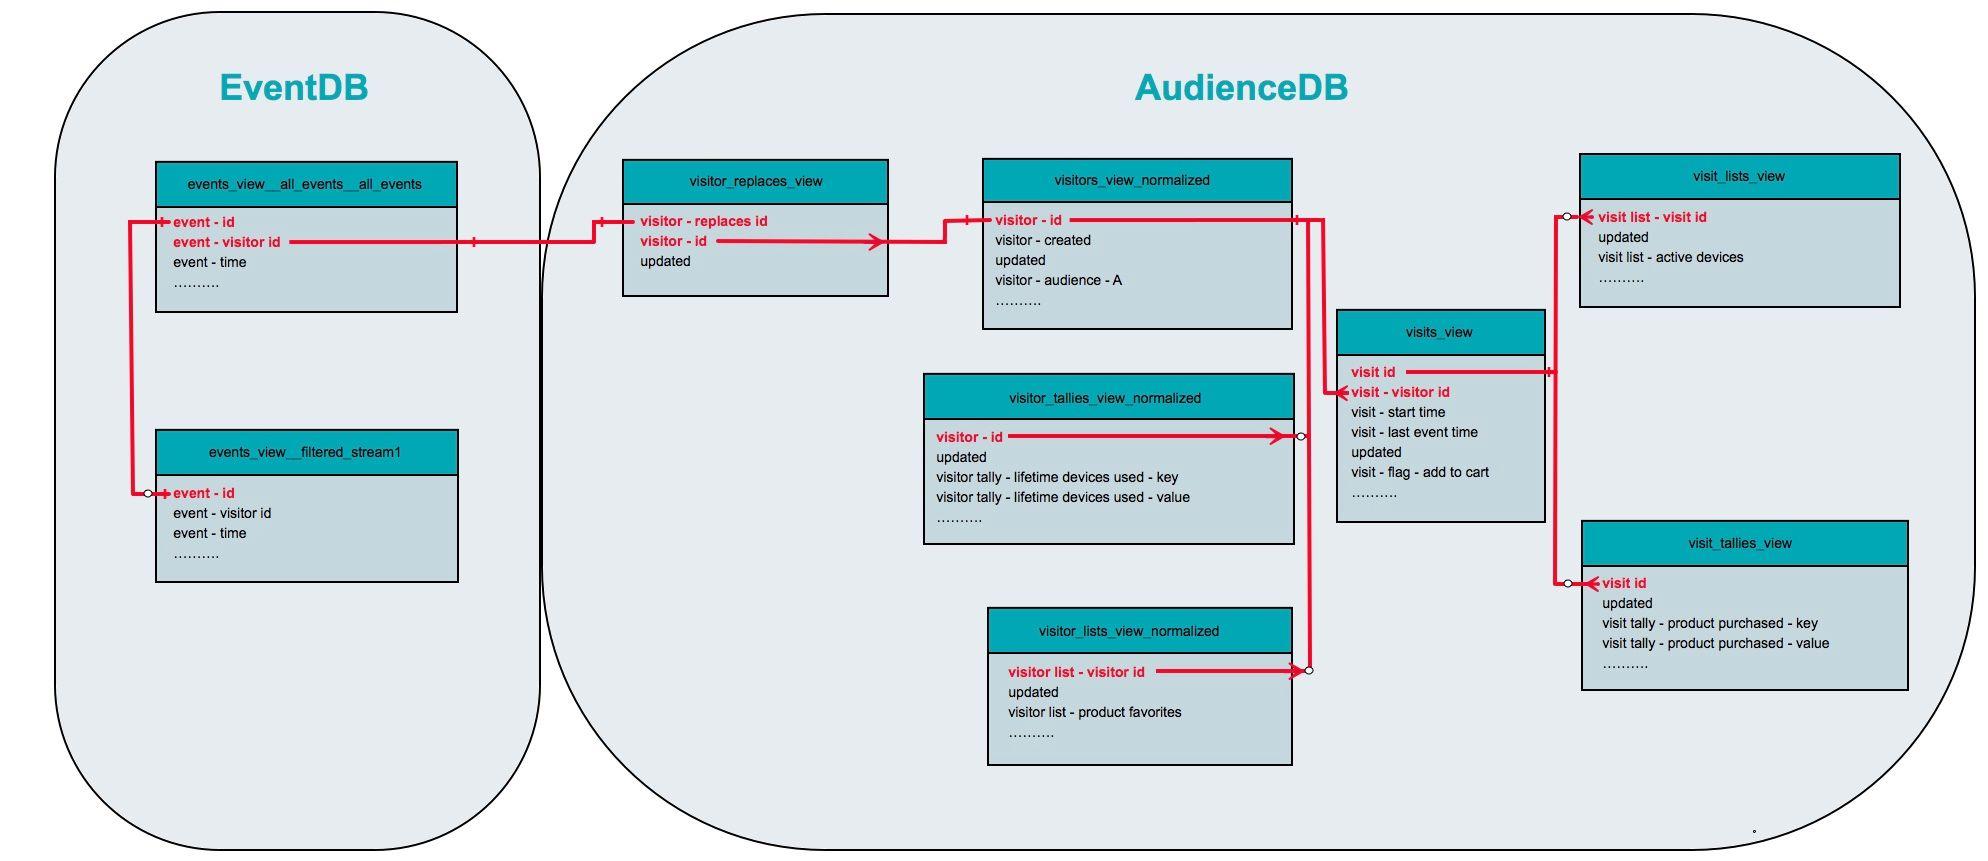 AudienceDB Data Guide - DataAccess - Tealium Learning Community